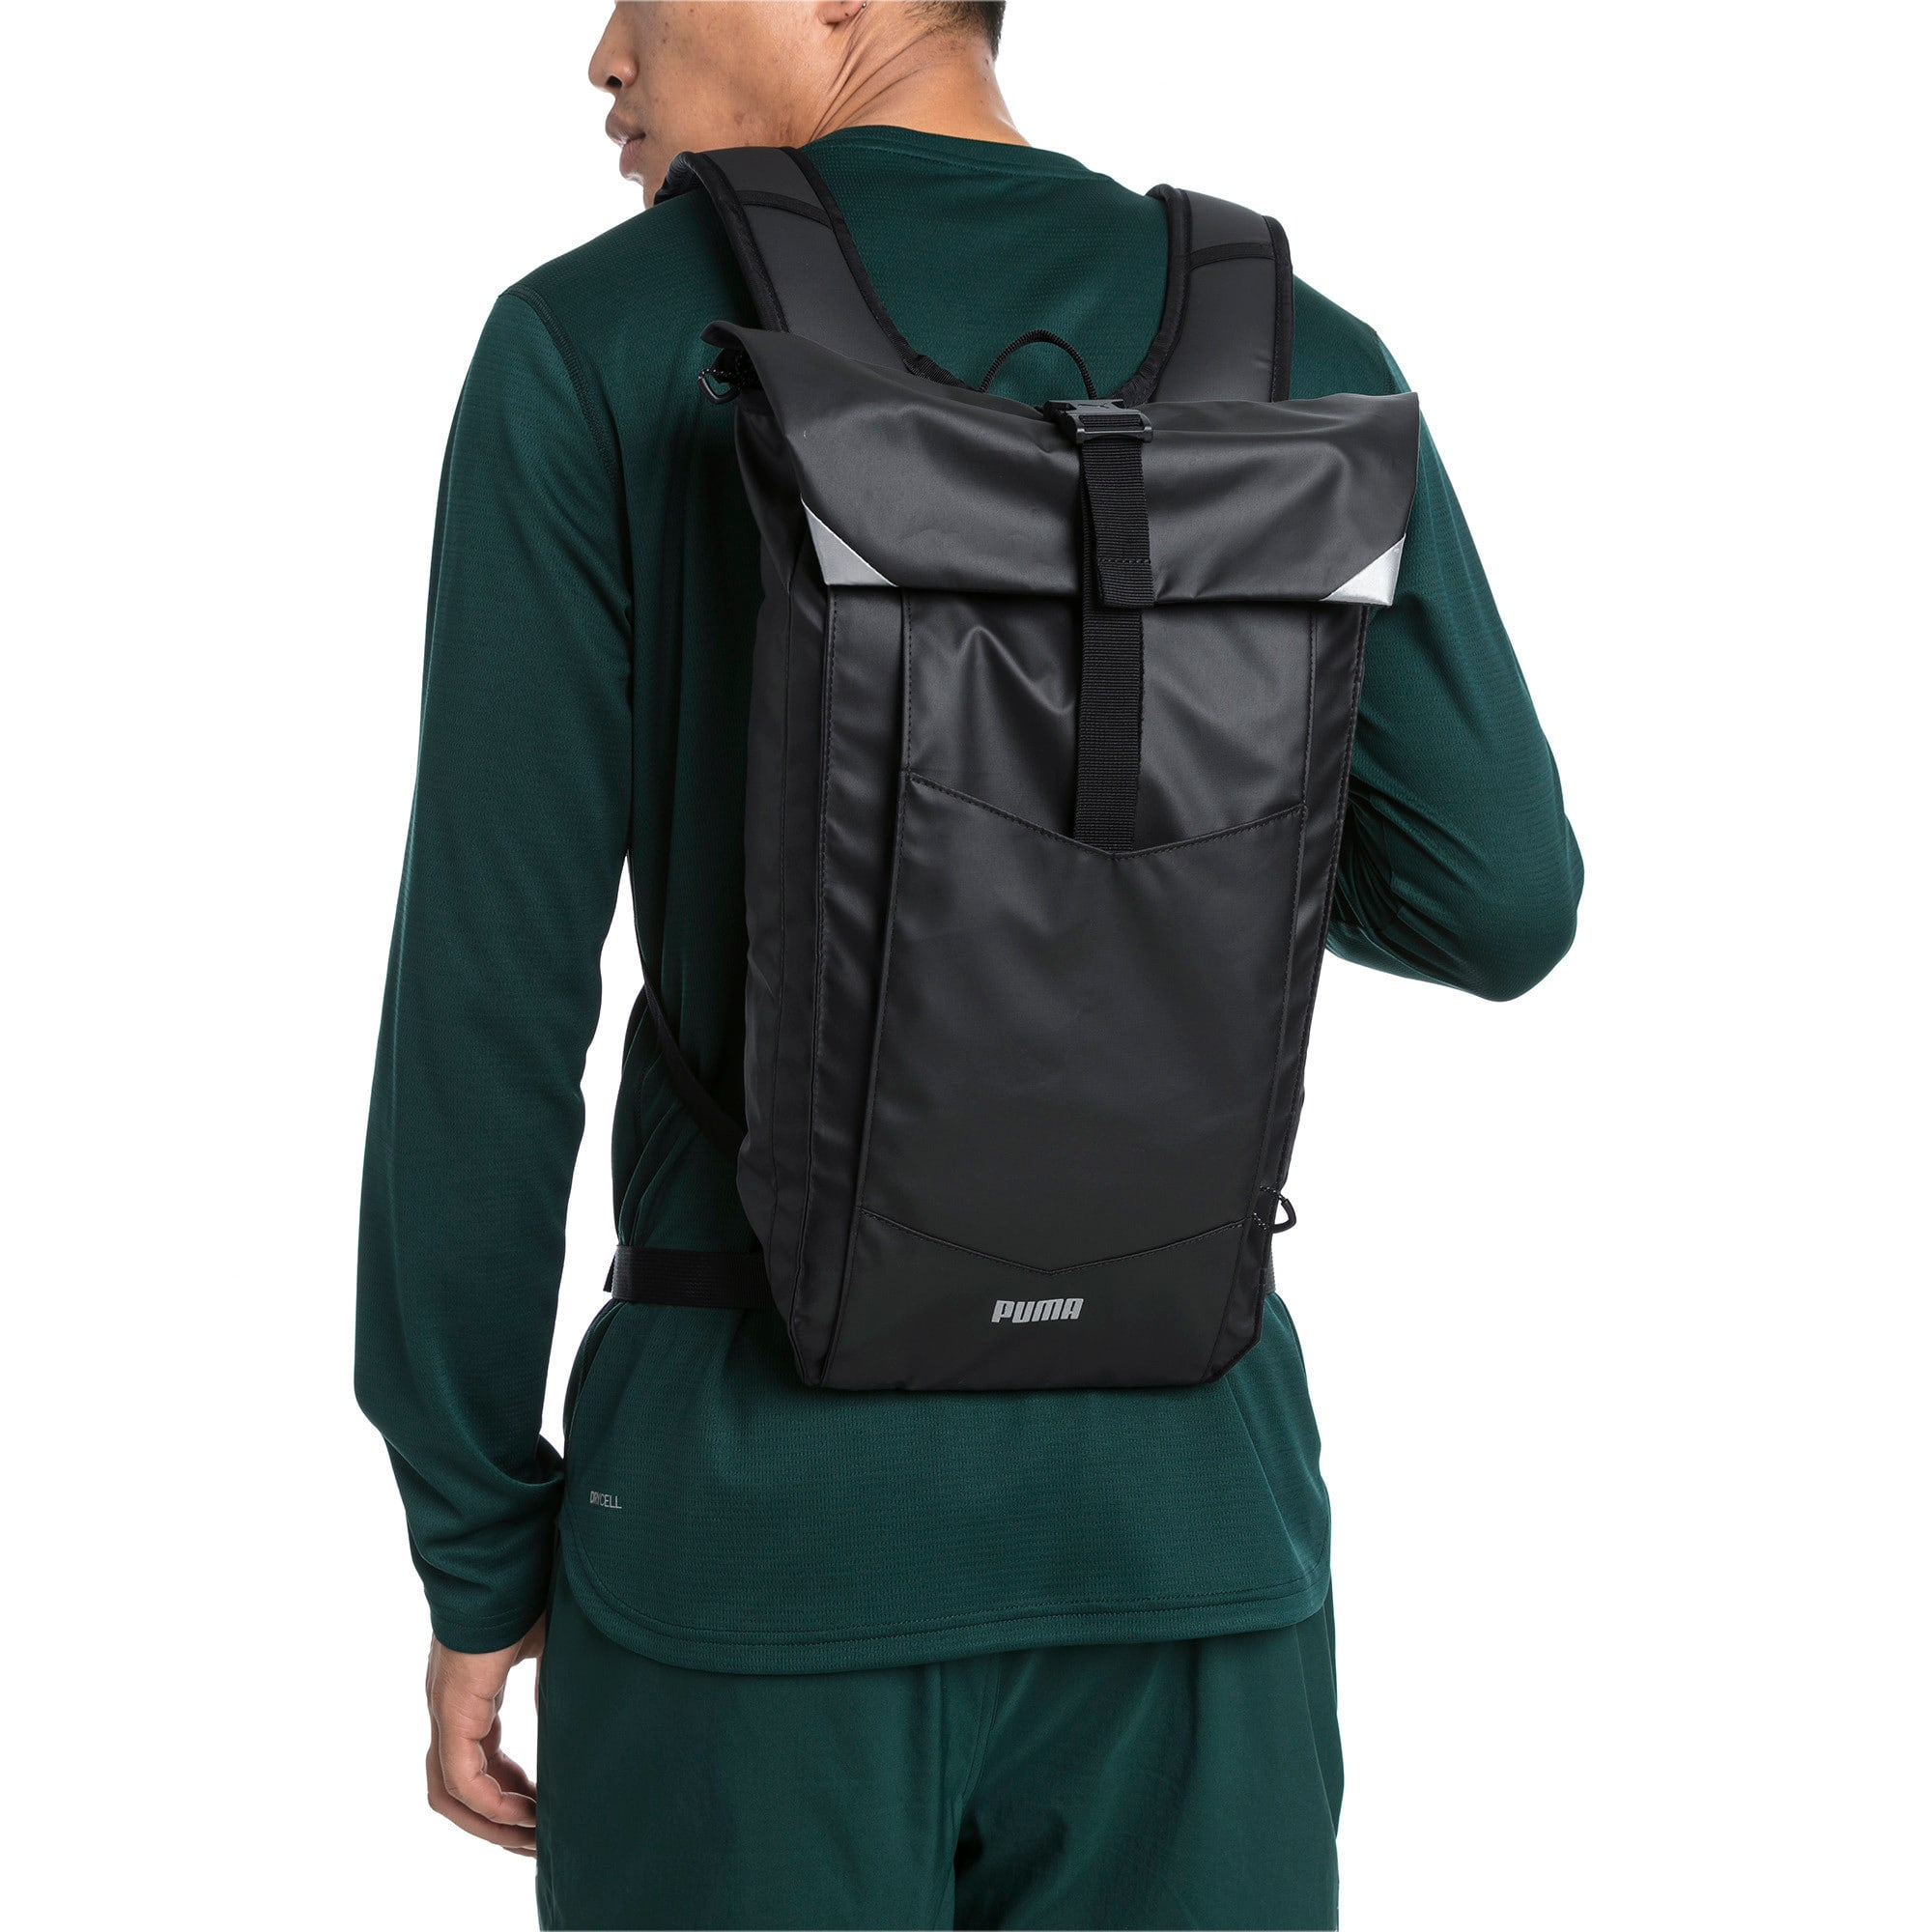 Thumbnail 2 of Street Running Backpack, Puma Black, medium